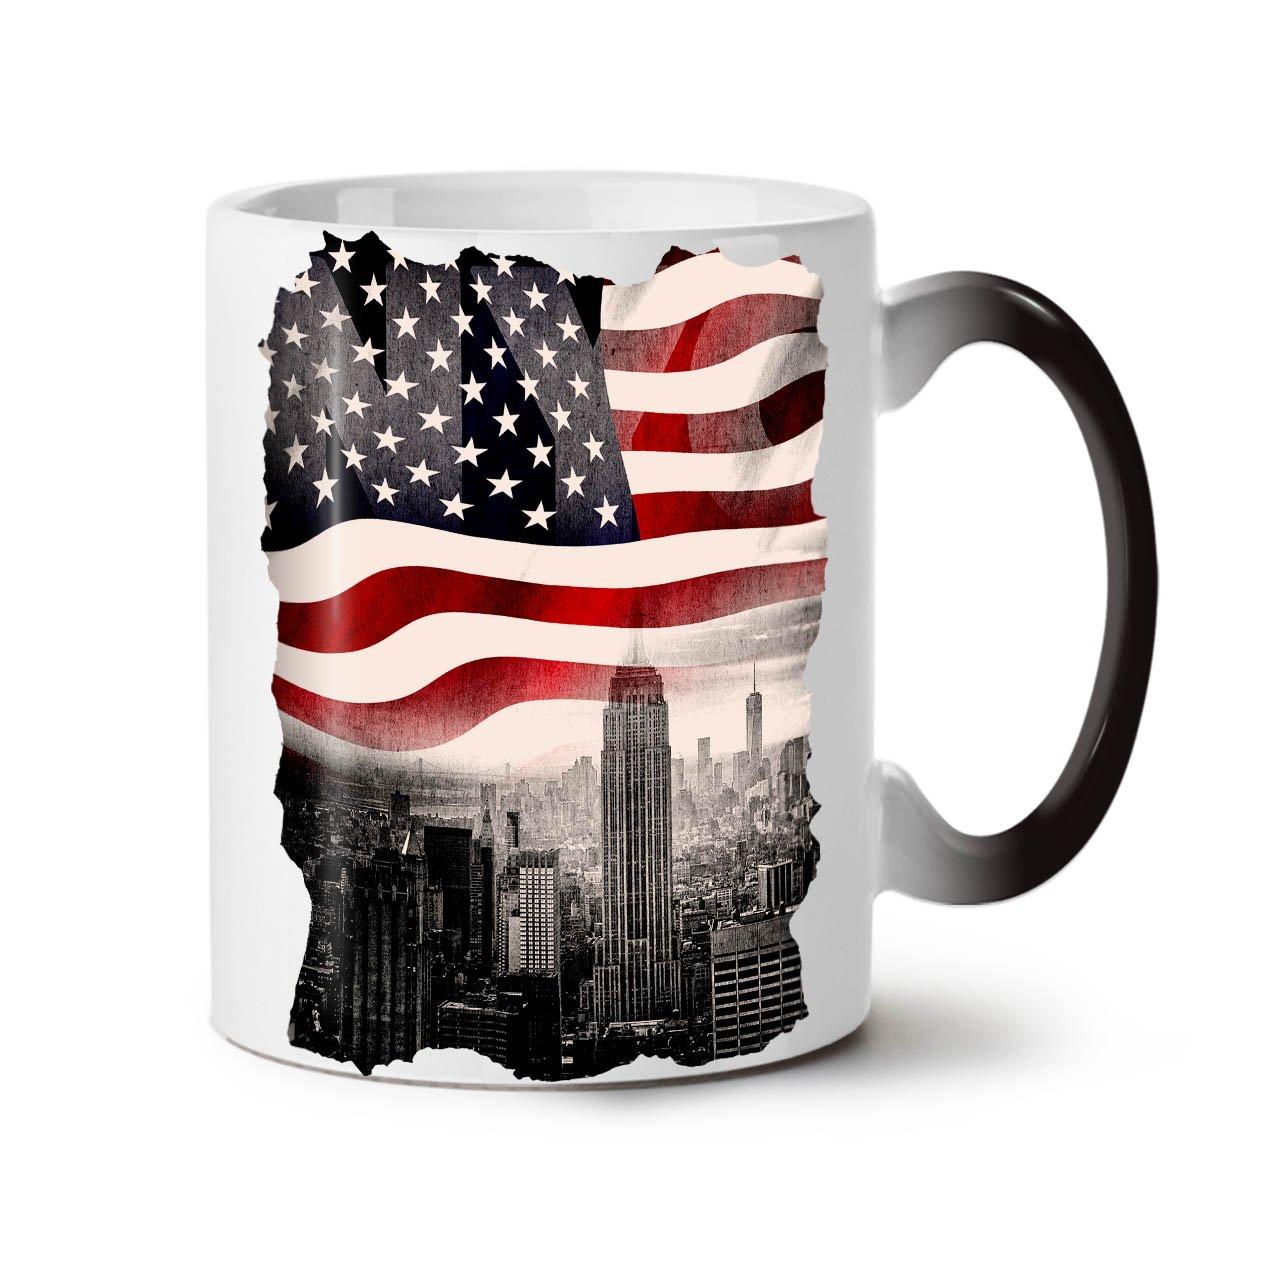 New York America NEW Colour Changing Tea Coffee Mug 11 ozWellcoda